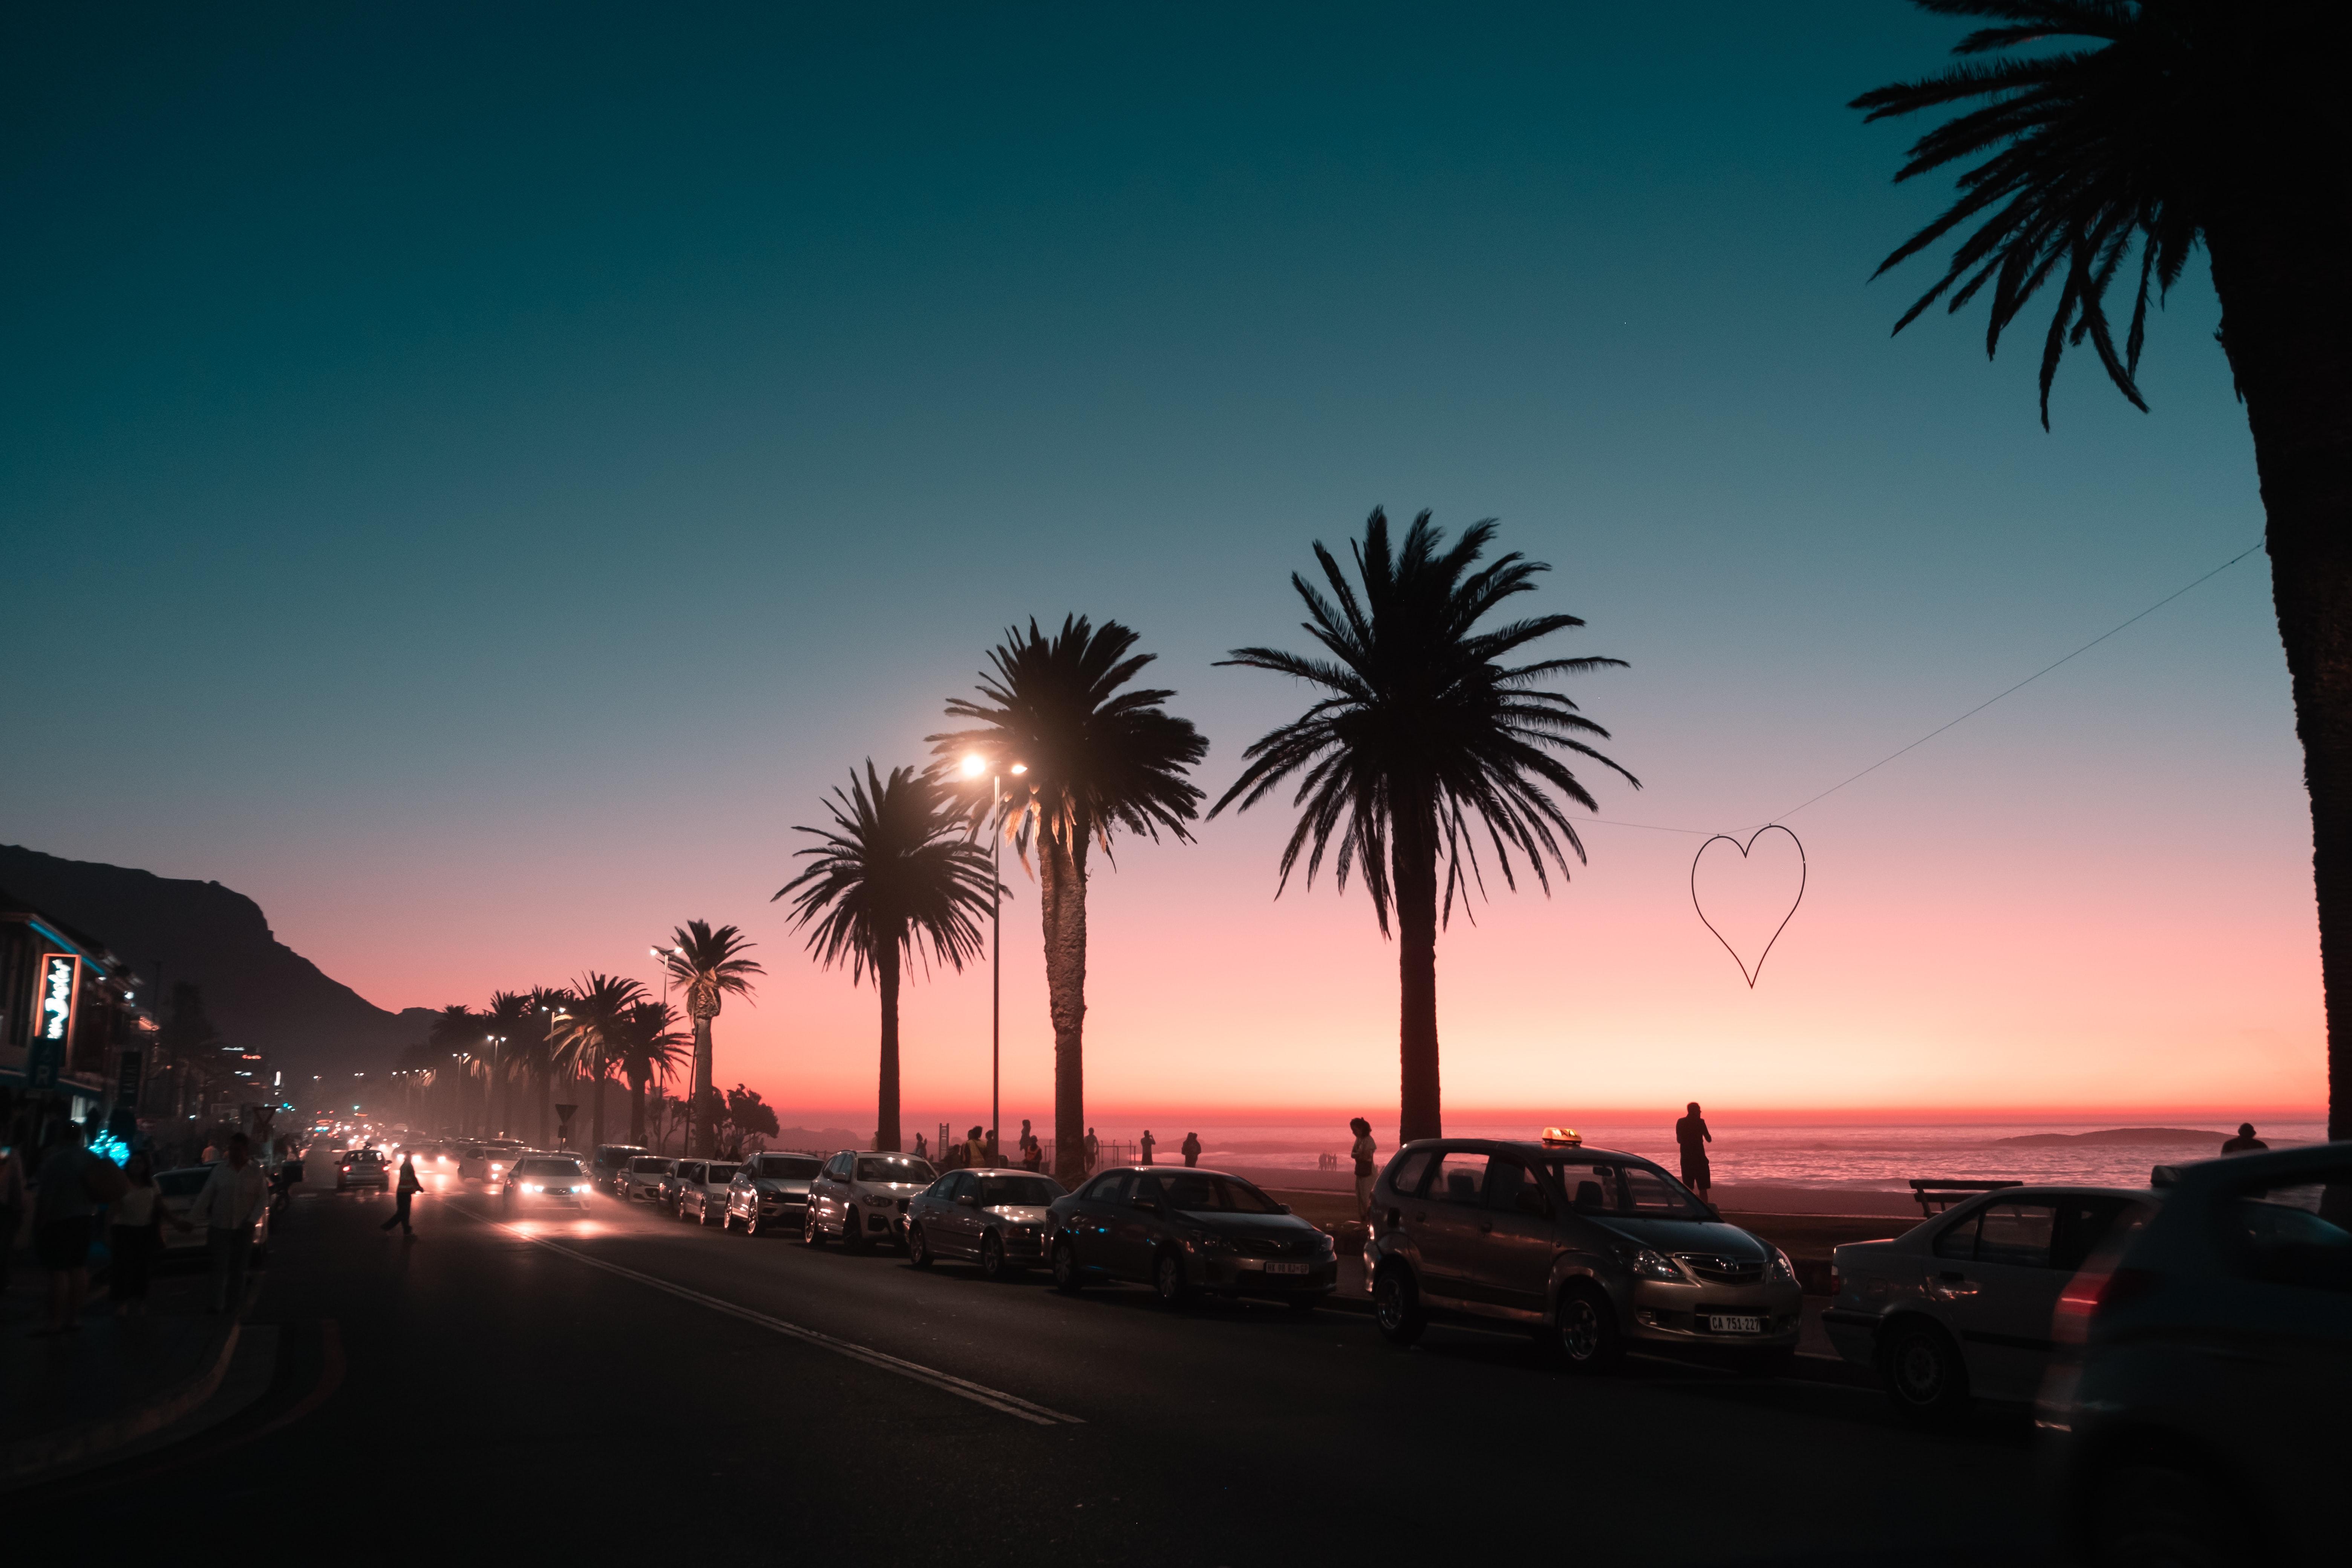 Sundowner/ Riverlights Evening Cruise